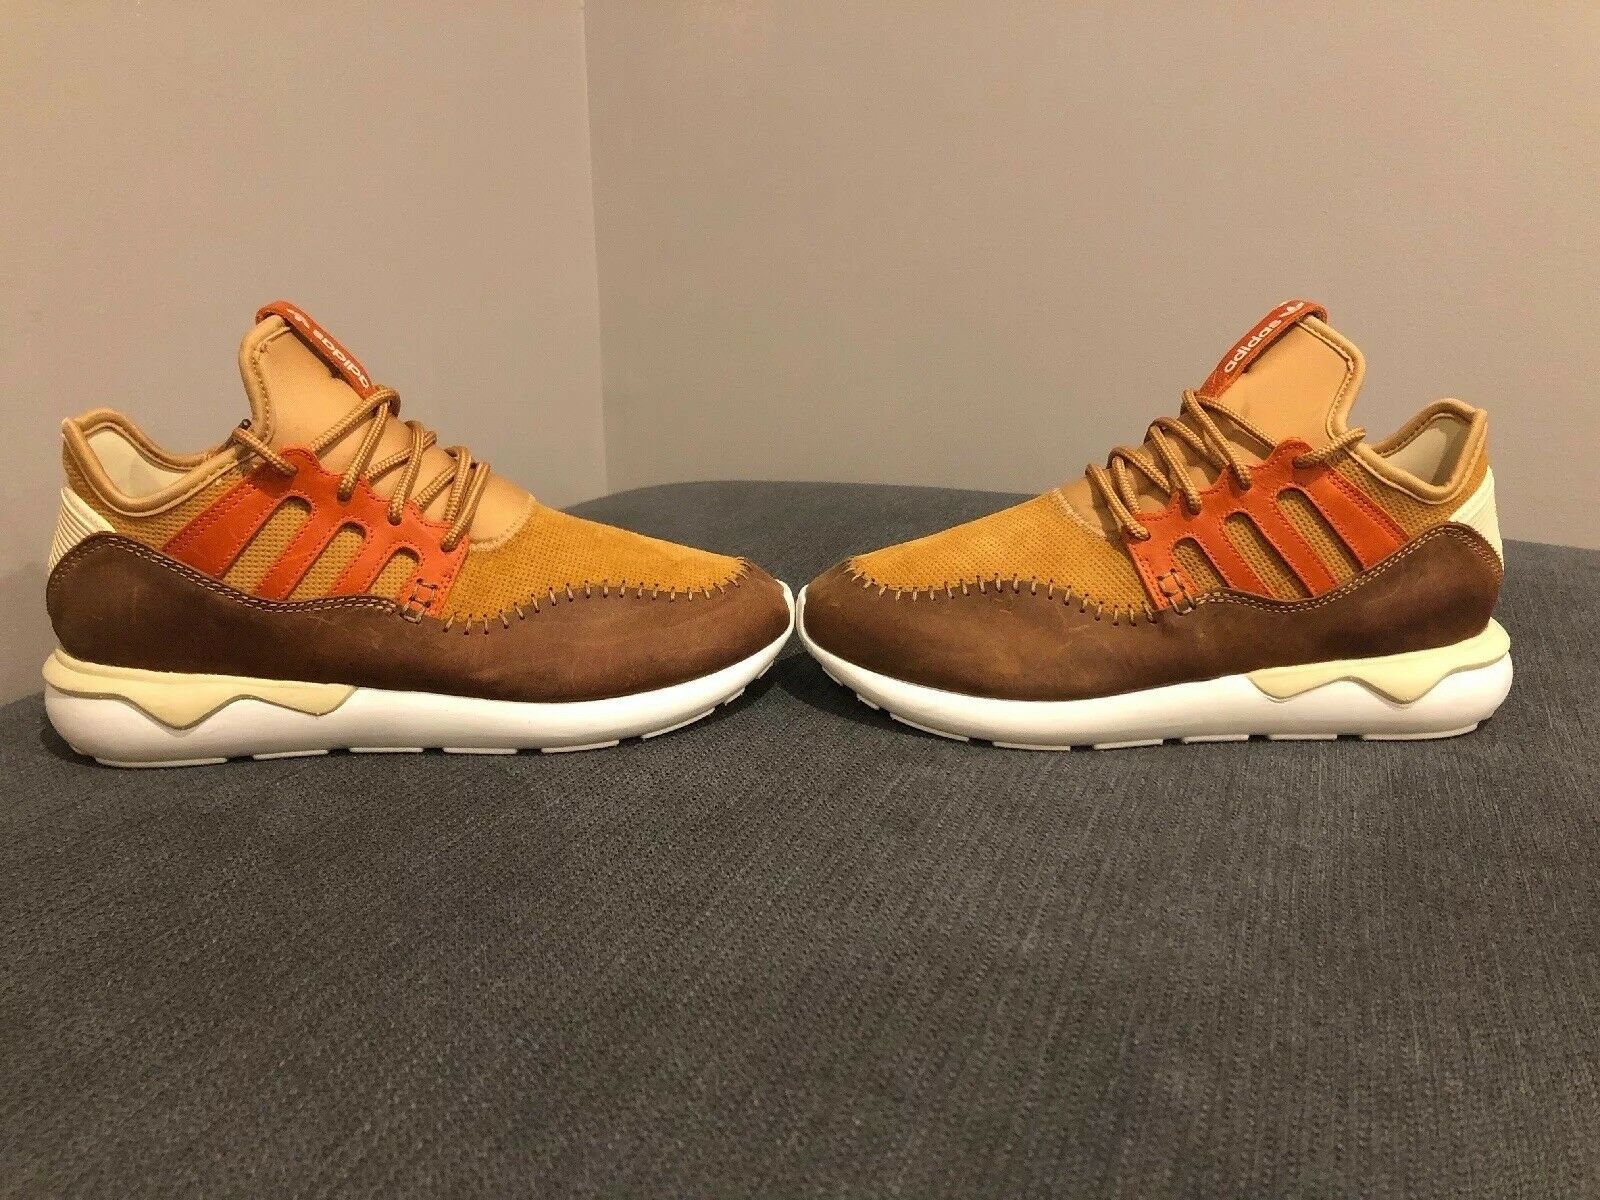 Adidas Tubular Moccasin Moc Runners shoes, Men's Size 10, RARE